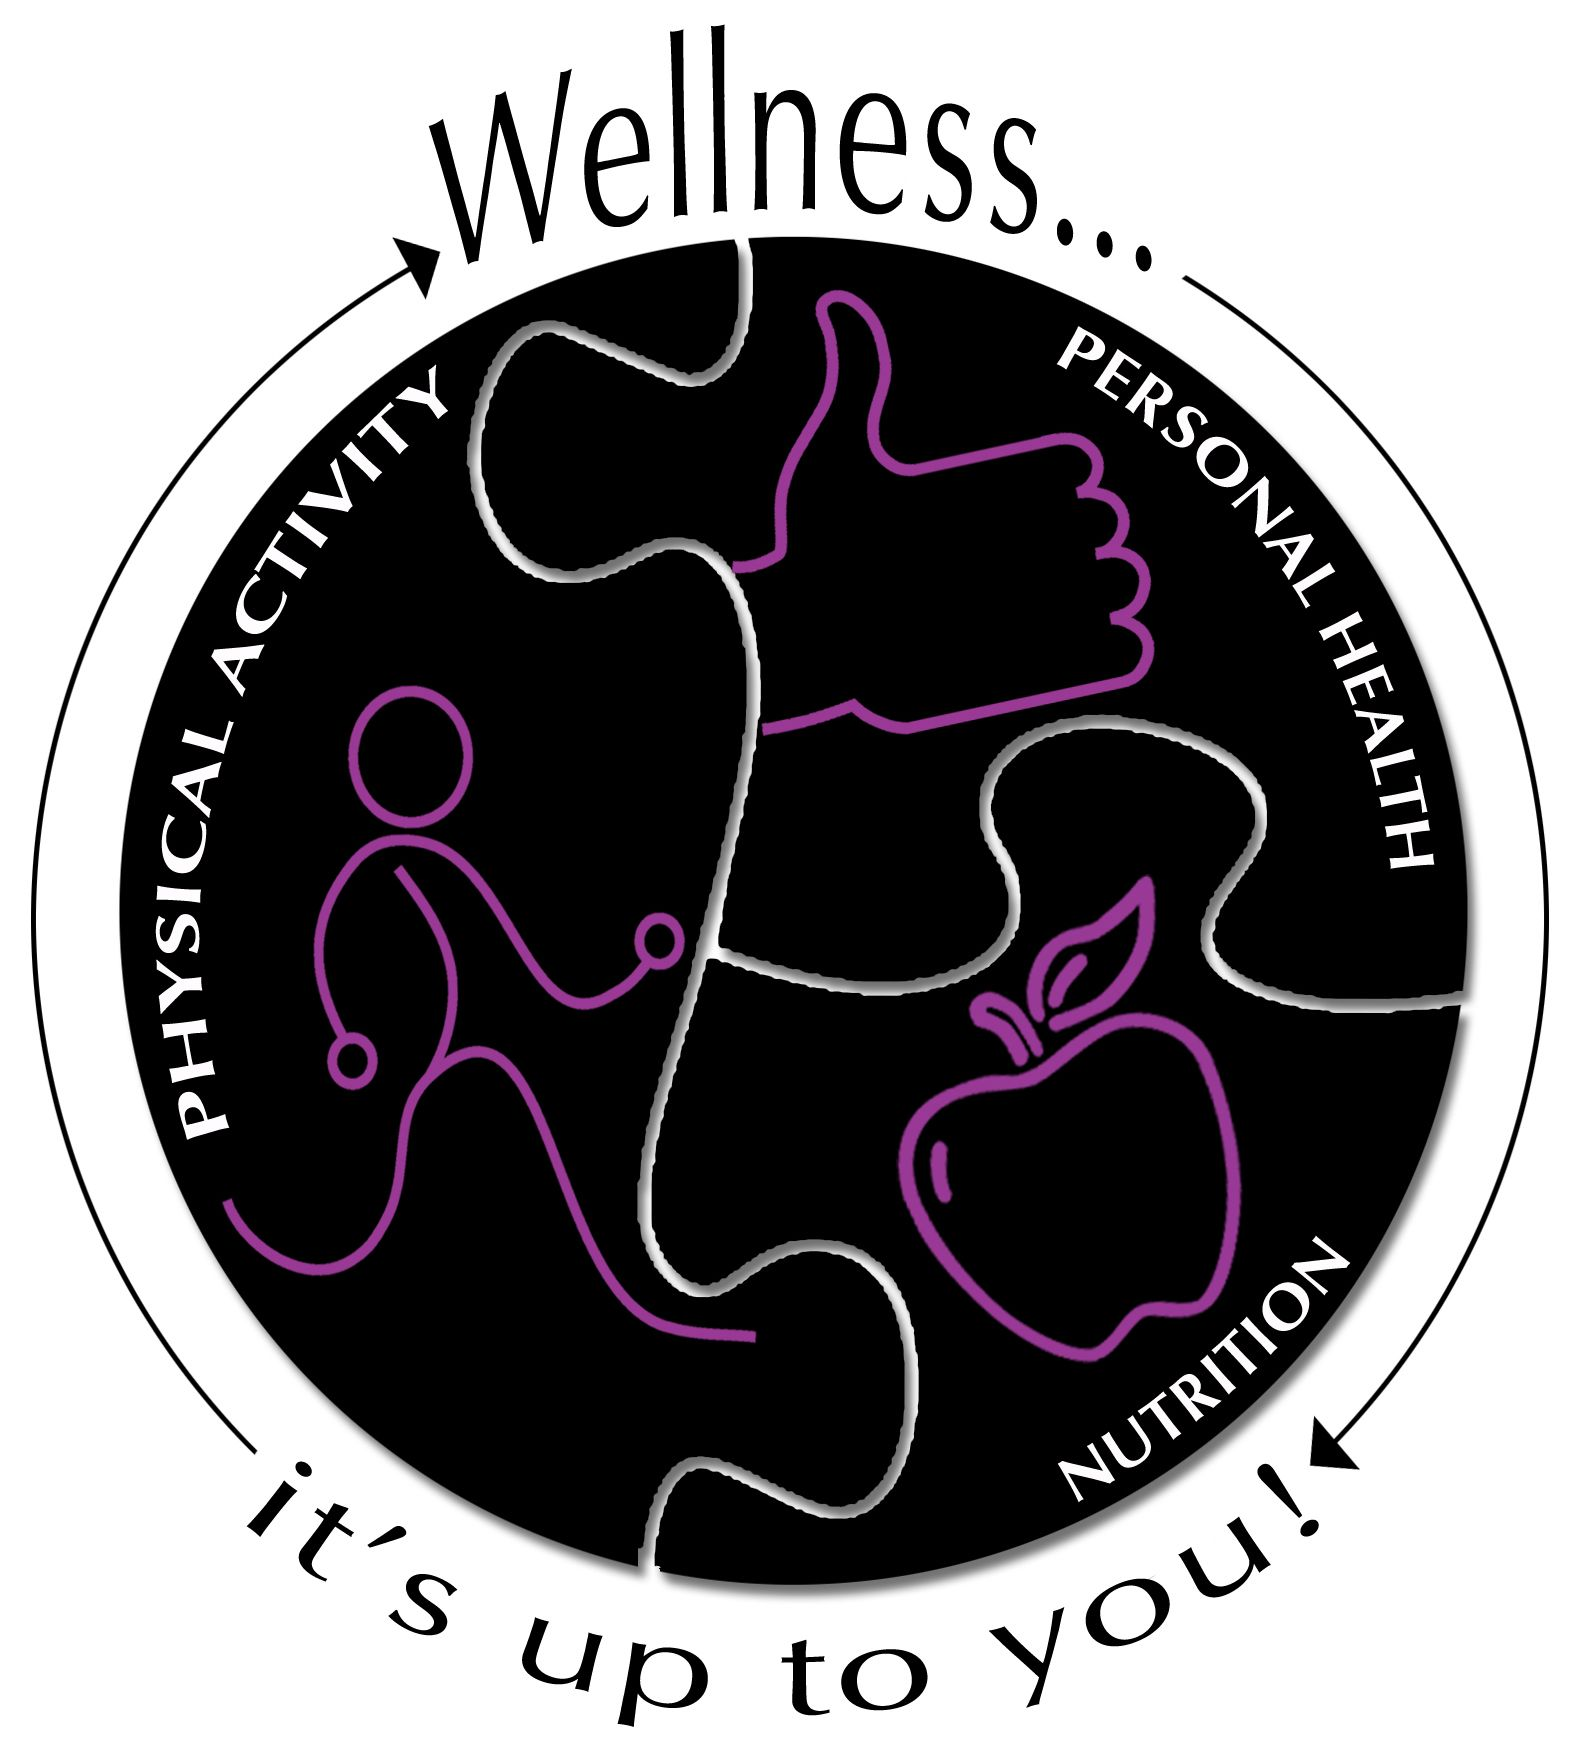 Are you well health activities wellness coach wellness